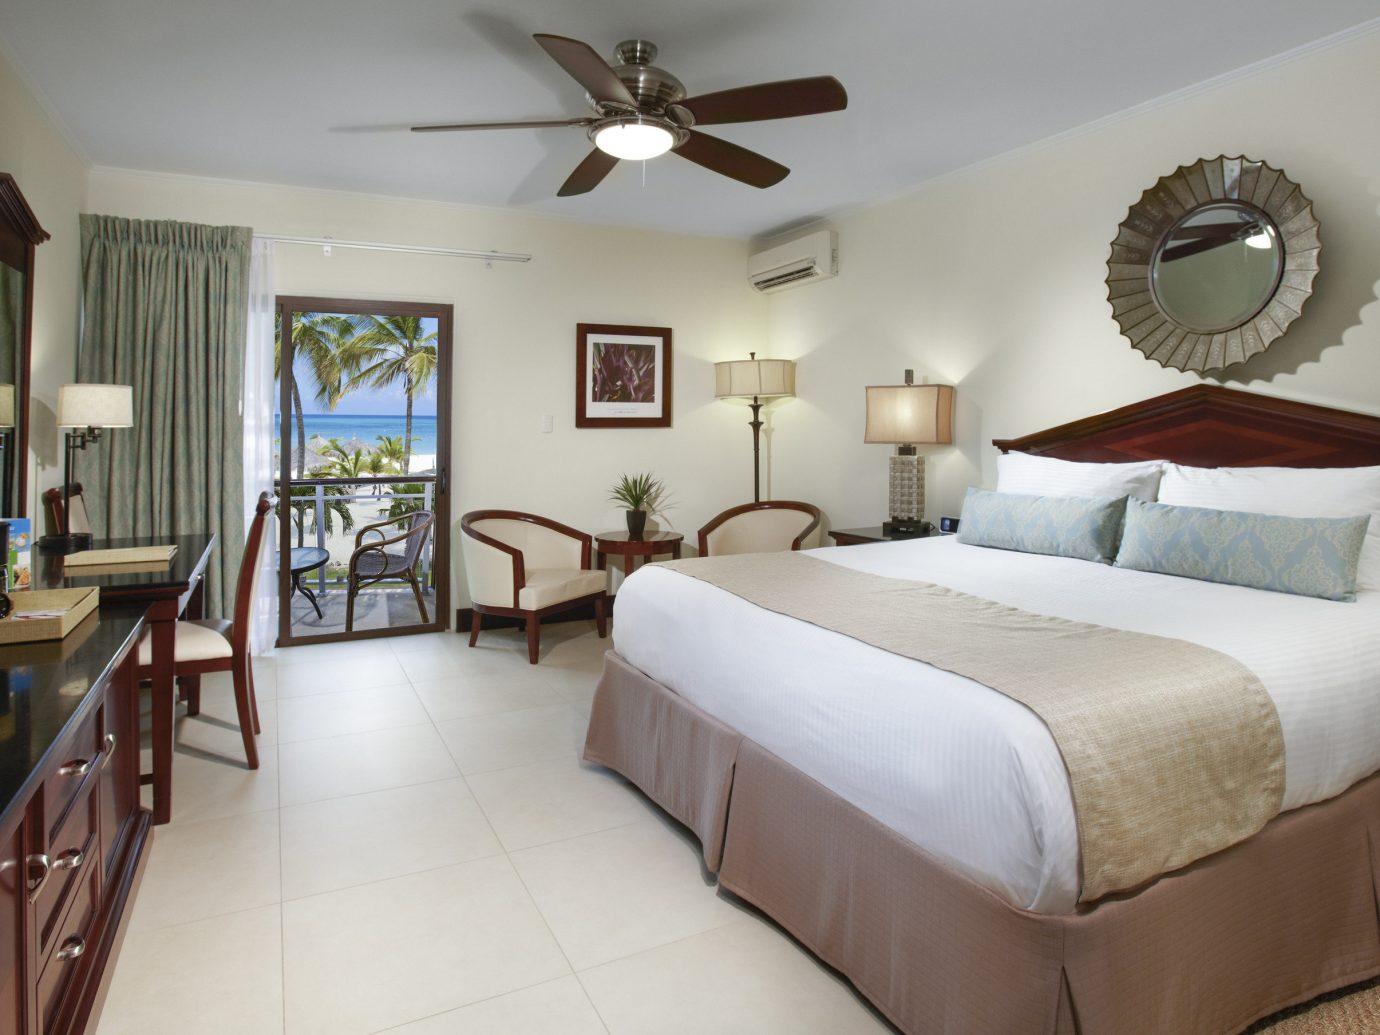 Aruba caribbean Hotels indoor floor wall bed room property Bedroom ceiling hotel estate cottage home real estate Suite interior design Villa living room condominium apartment furniture